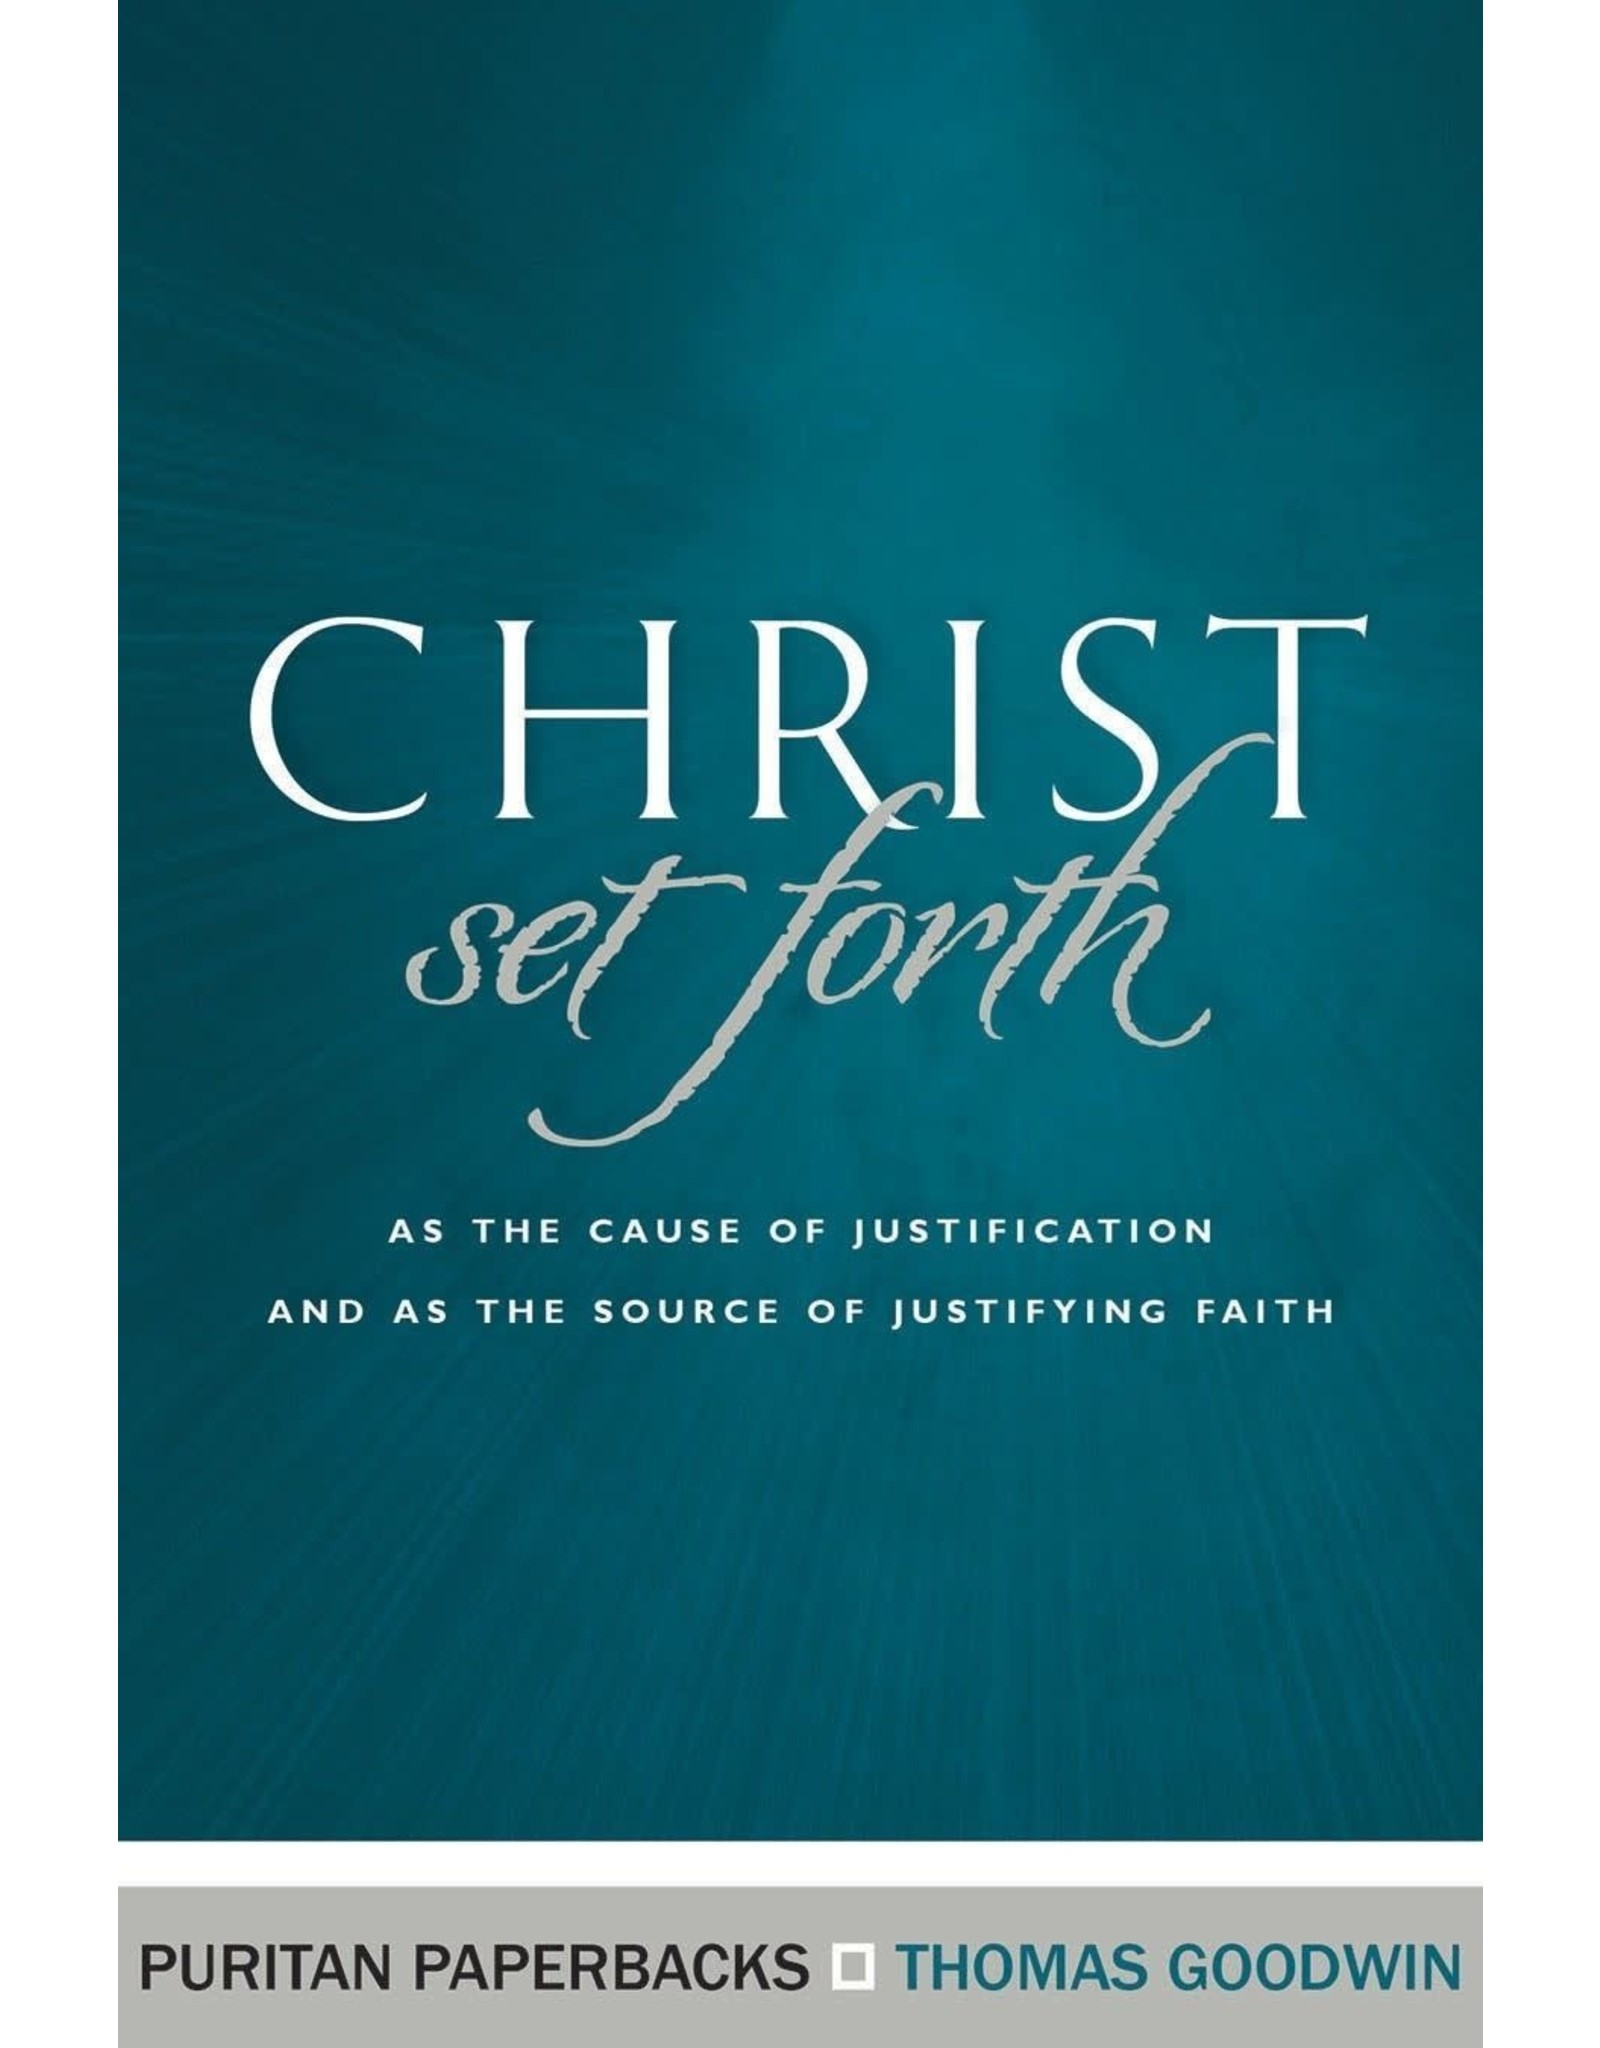 Goodwin Christ Set Forth